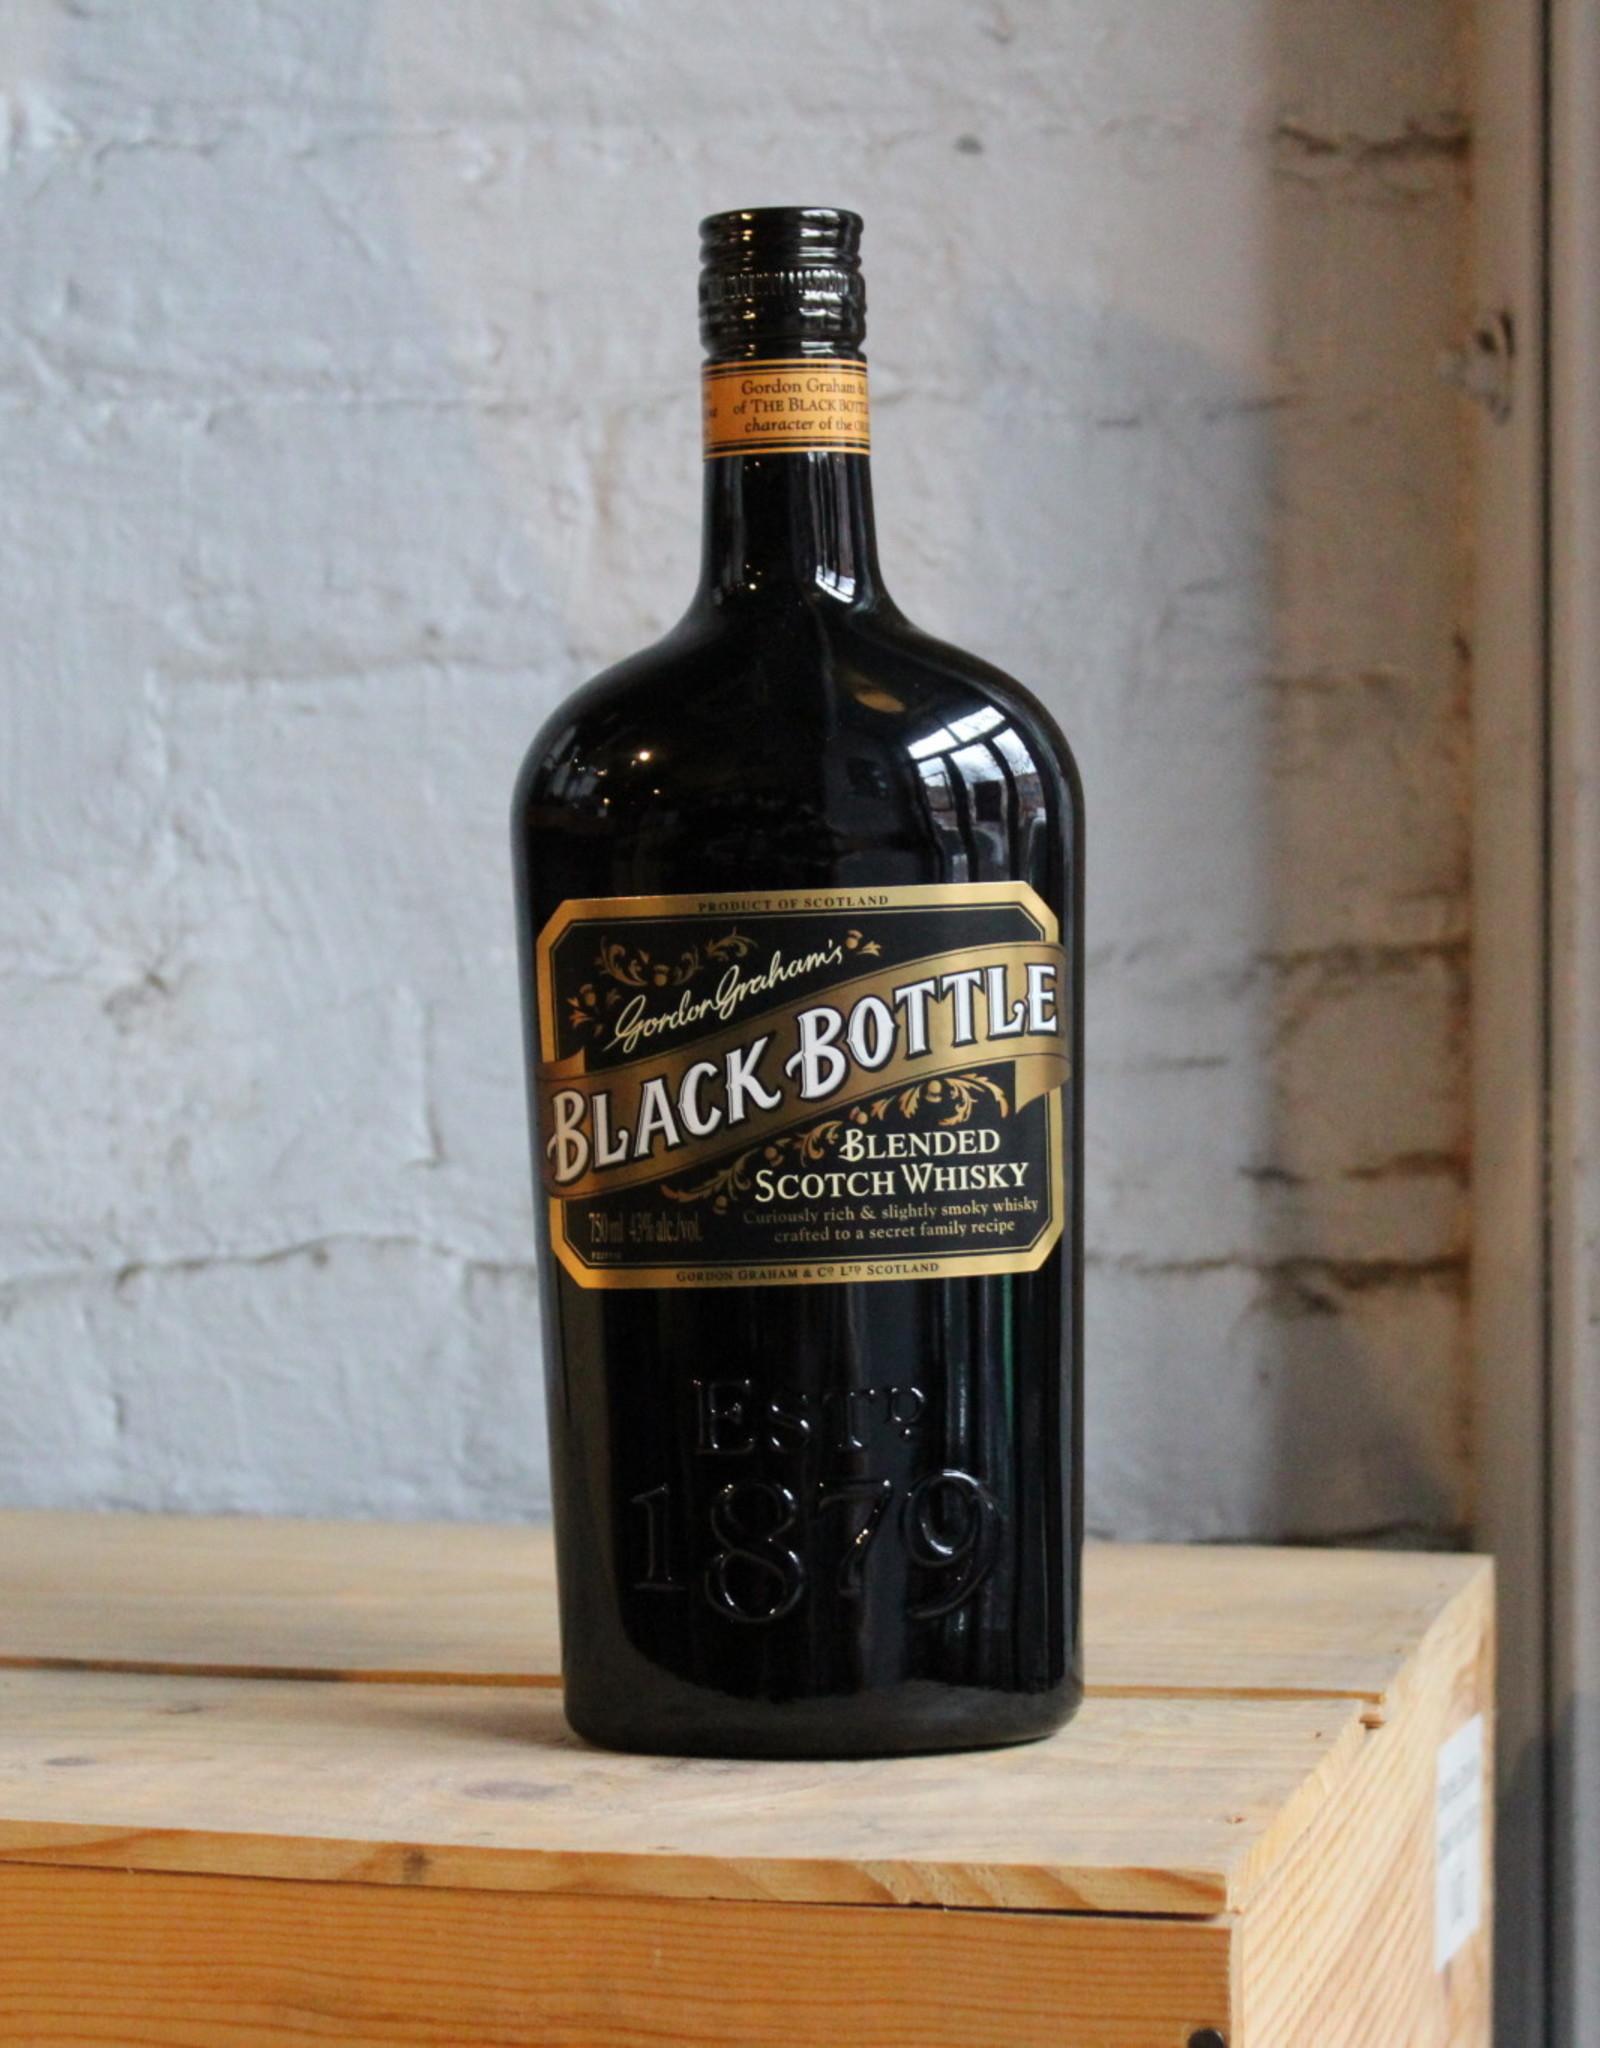 Black Bottle Blended Scotch Whisky - Scotland (750ml)